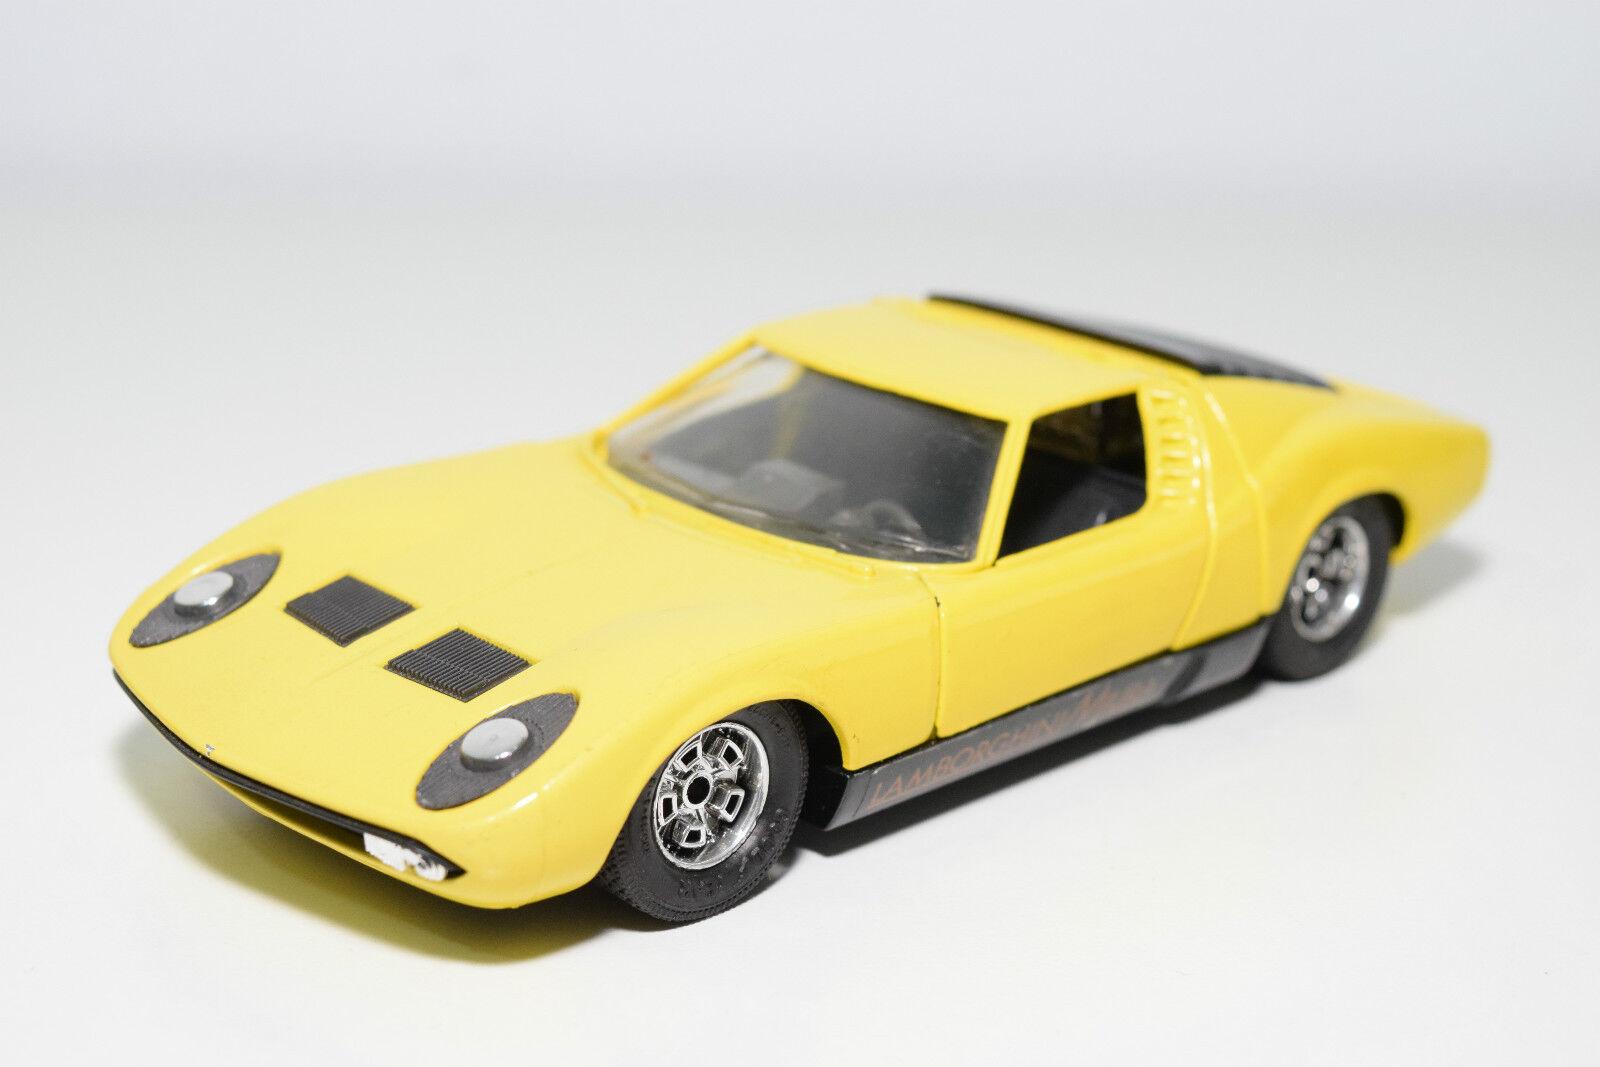 Eidai Grip EDAI Grip japón Lamborghini Miura giallo Near Mint rara vez rare raro